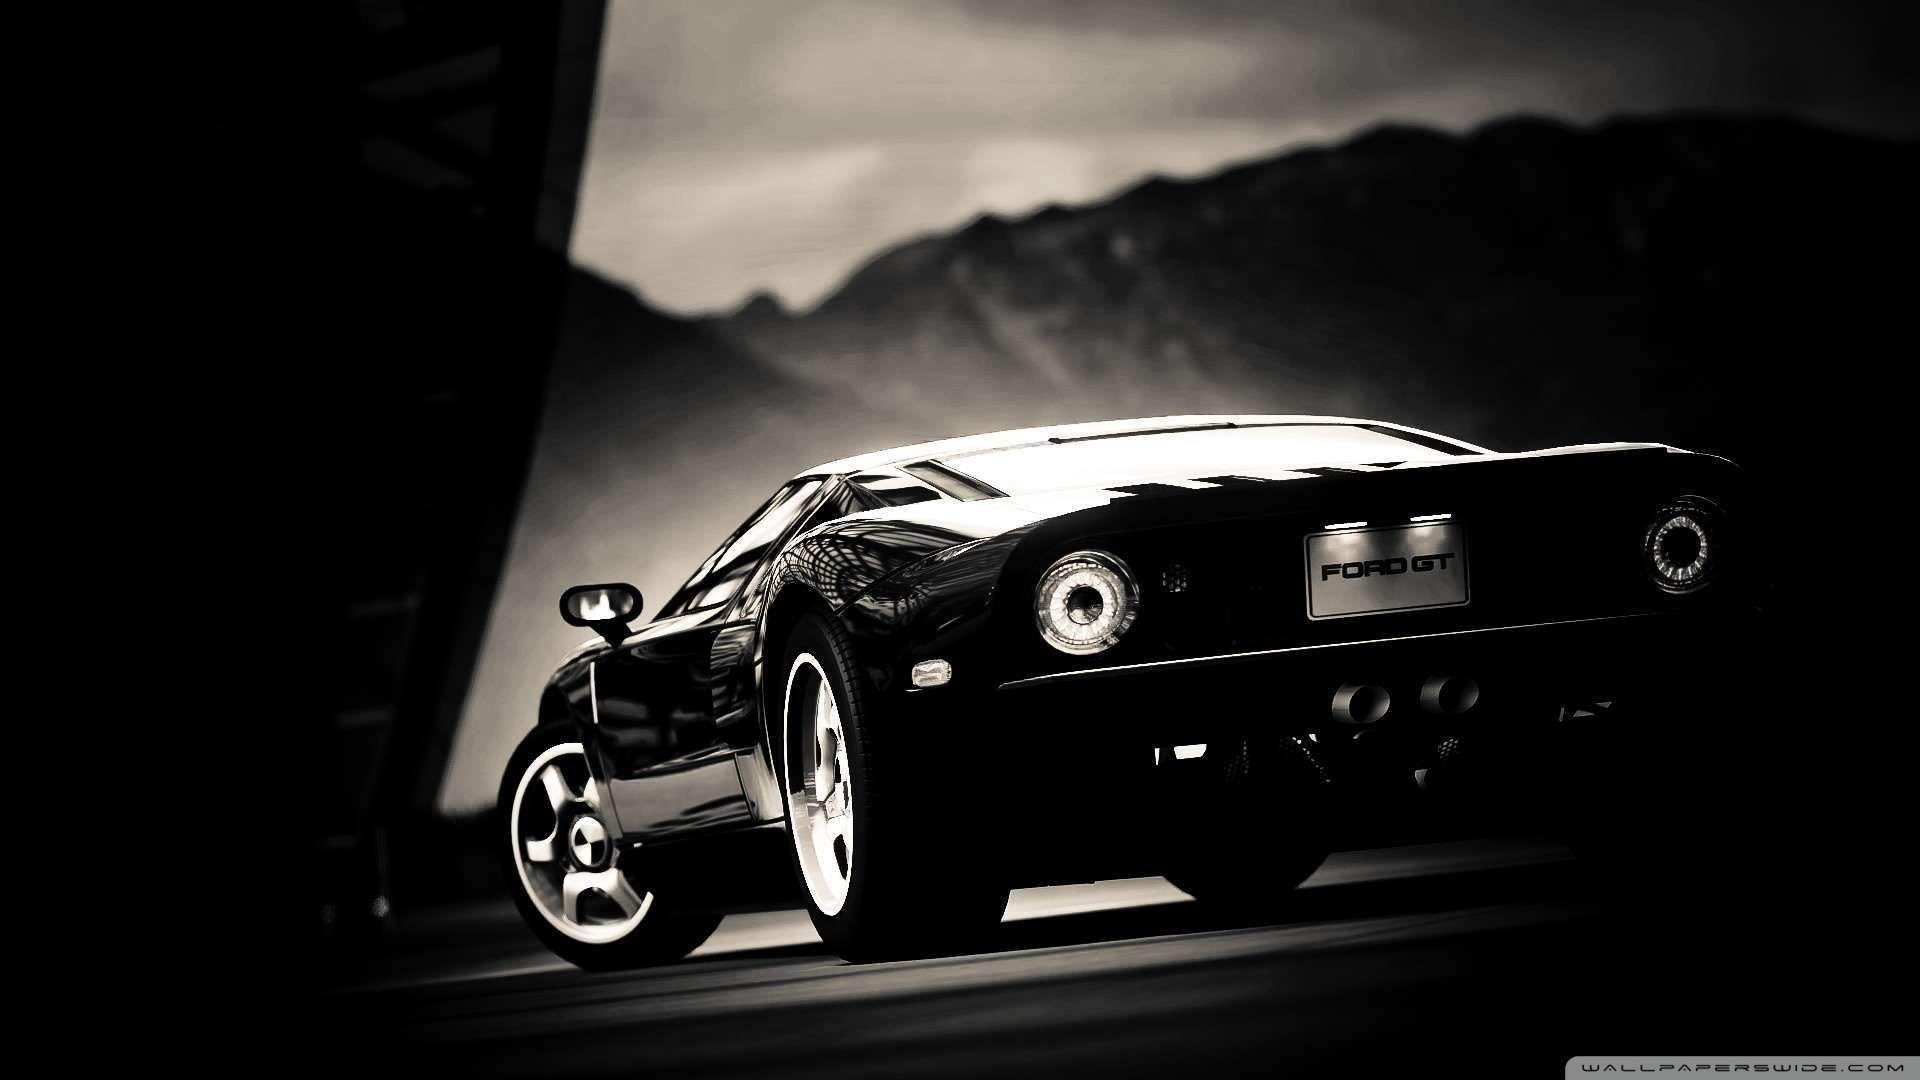 Res: 1920x1080, Ford Gt Black Wallpaper 1080p HD